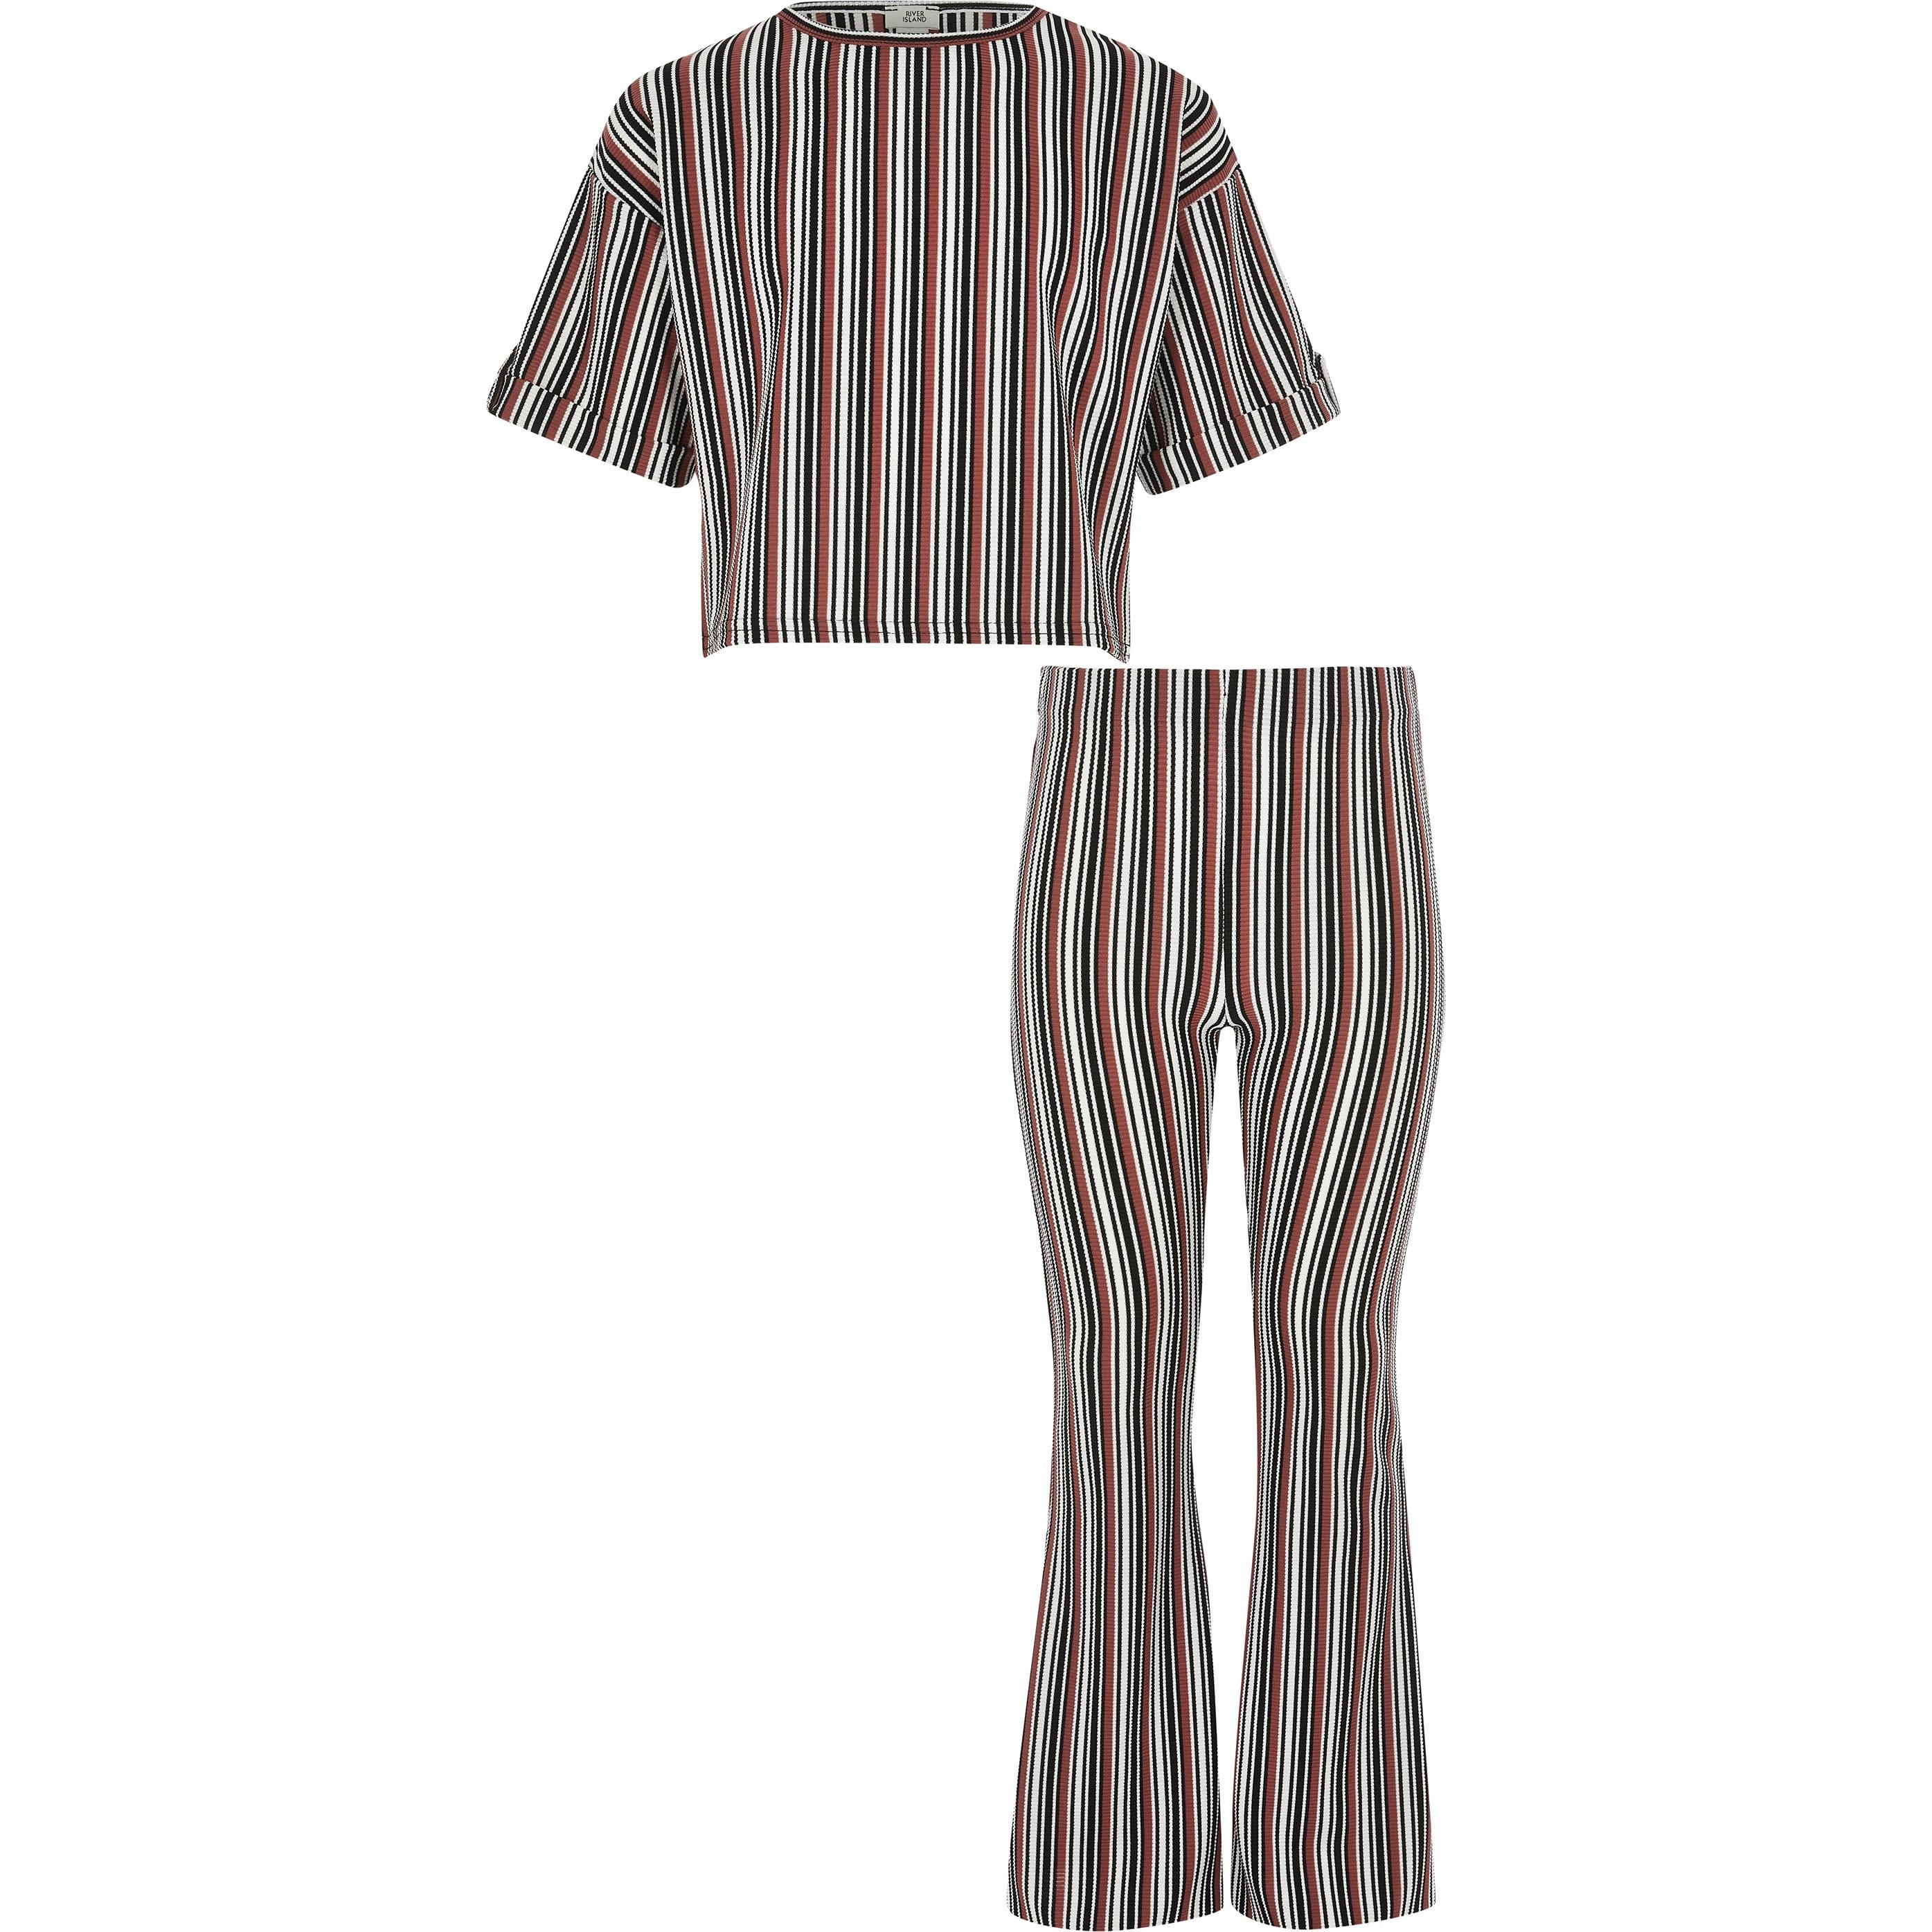 River Island Girls Black stripe T-shirt outfit (11-12 Yrs)